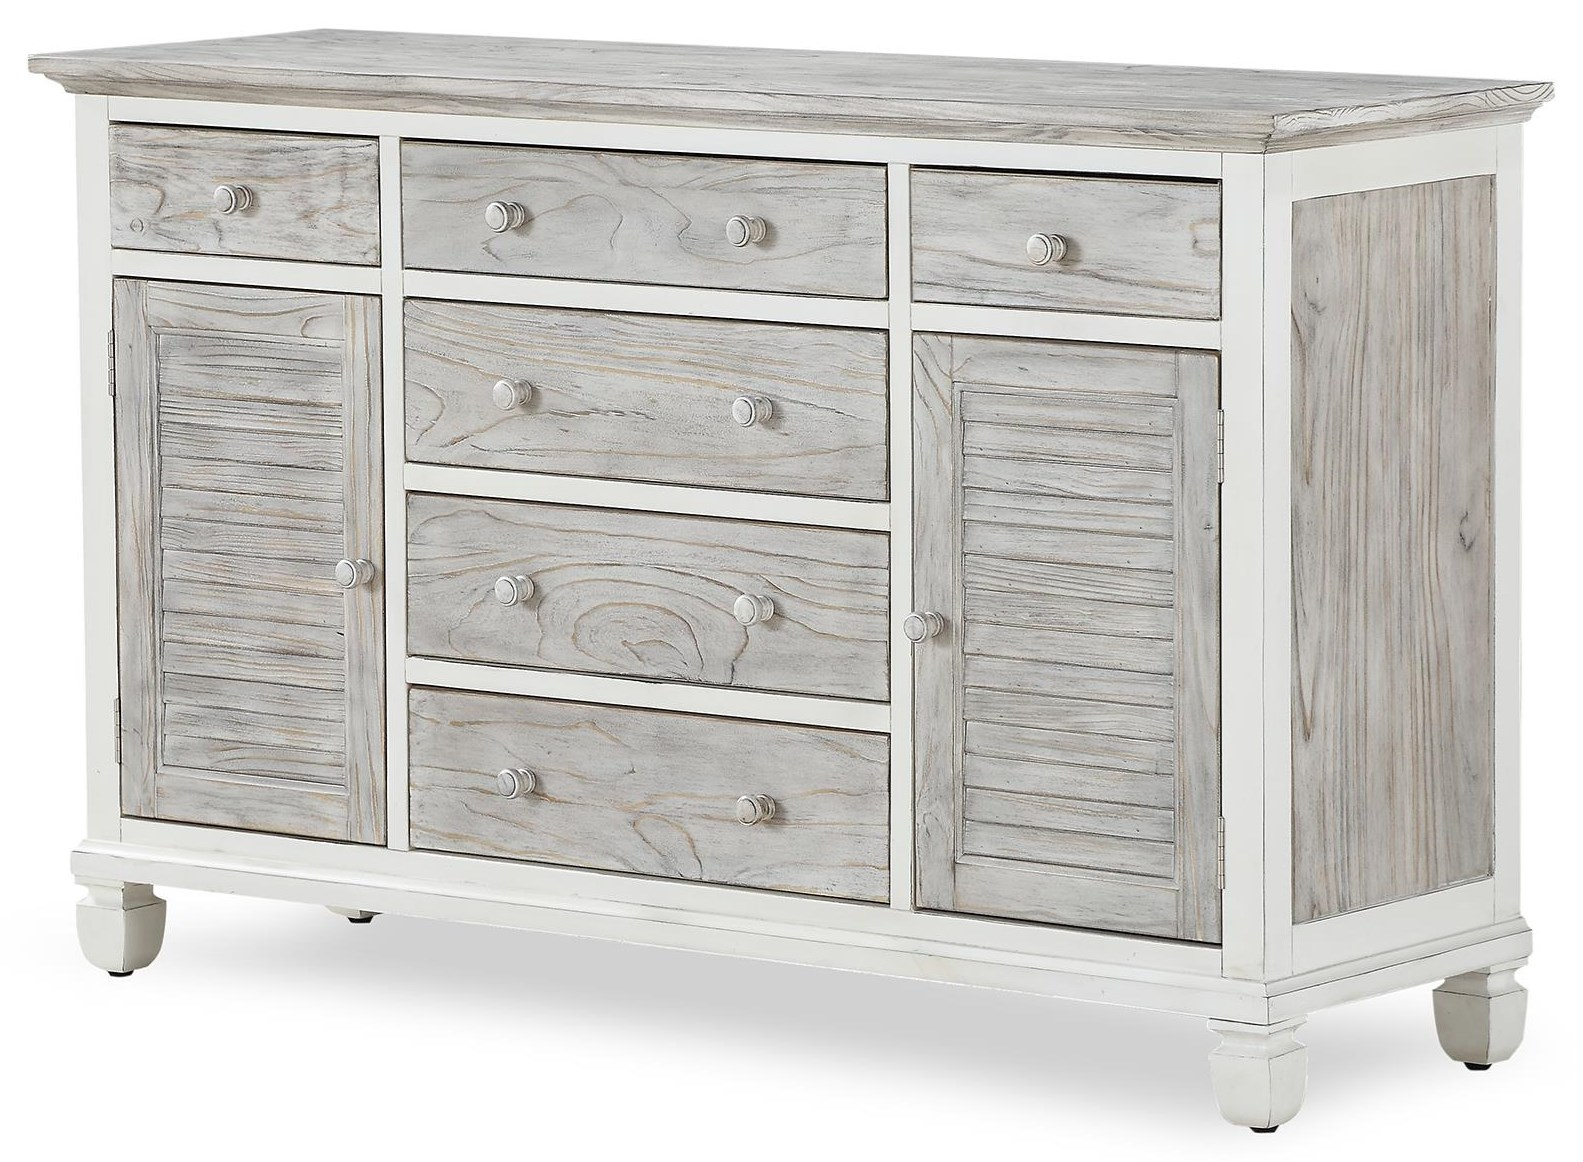 islamorada drawer/door dresser by Sea Winds Trading Company at Johnny Janosik